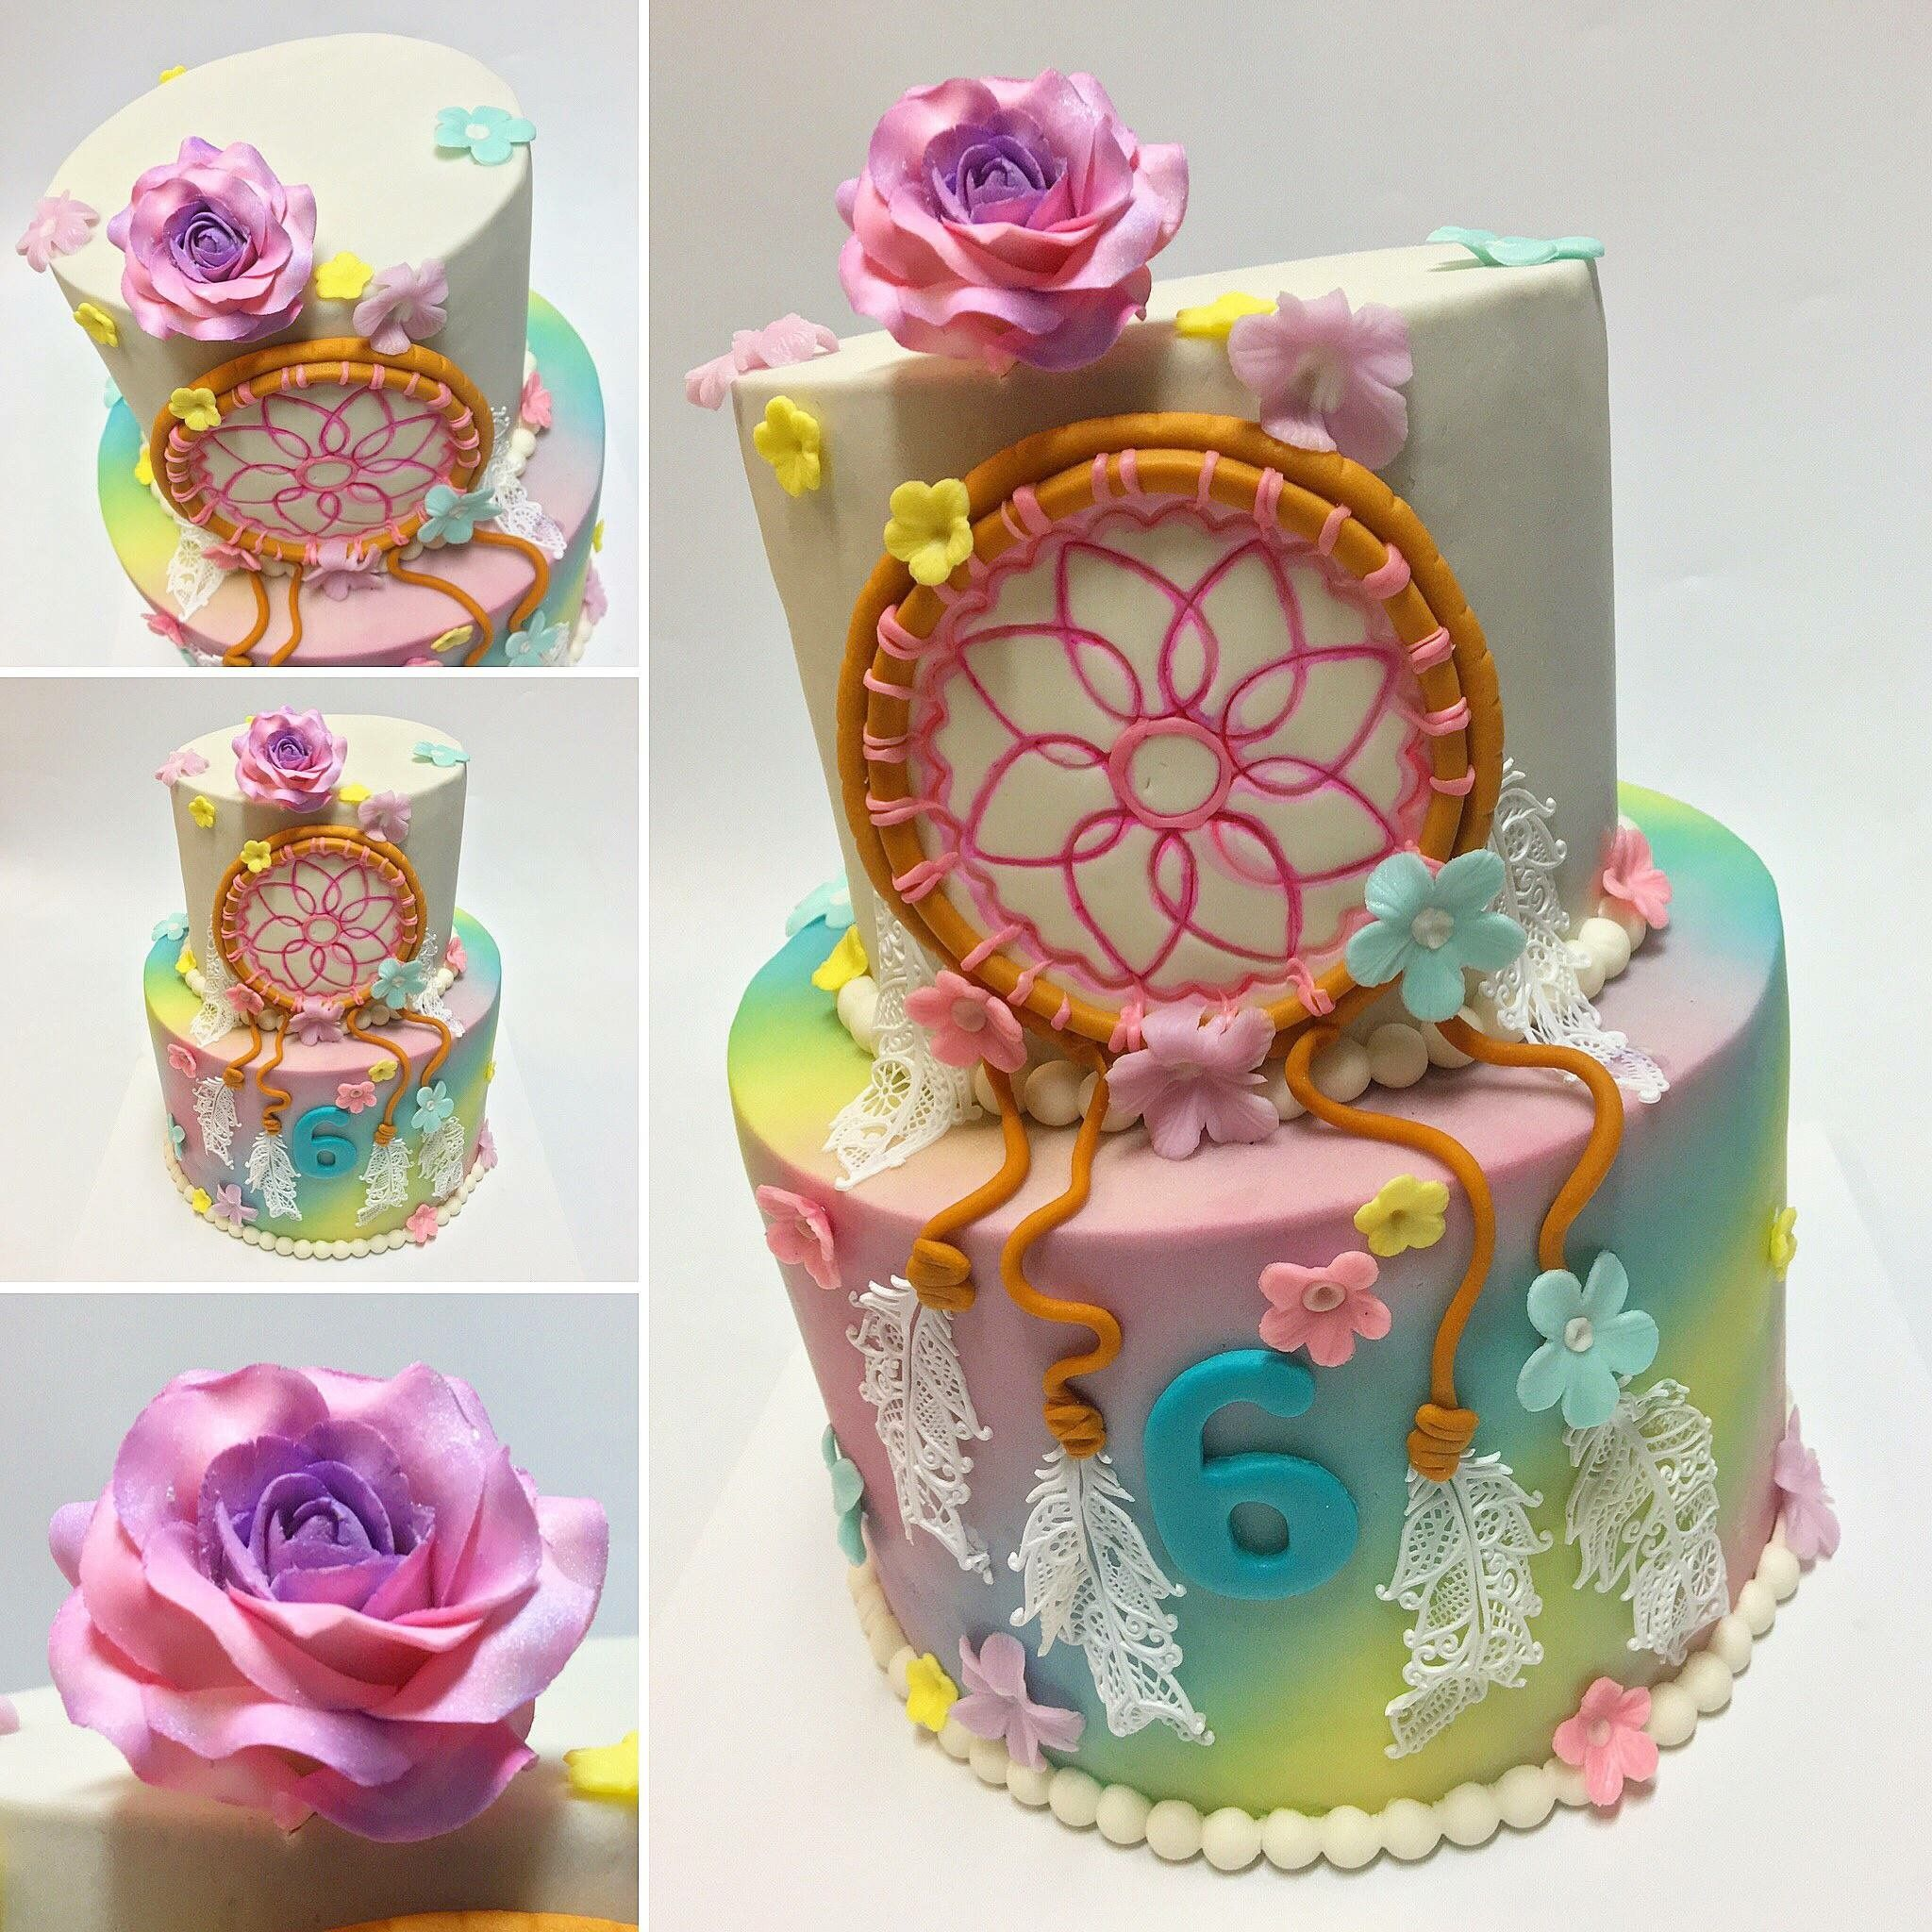 Pin By Susie Germano On Tween Cakes